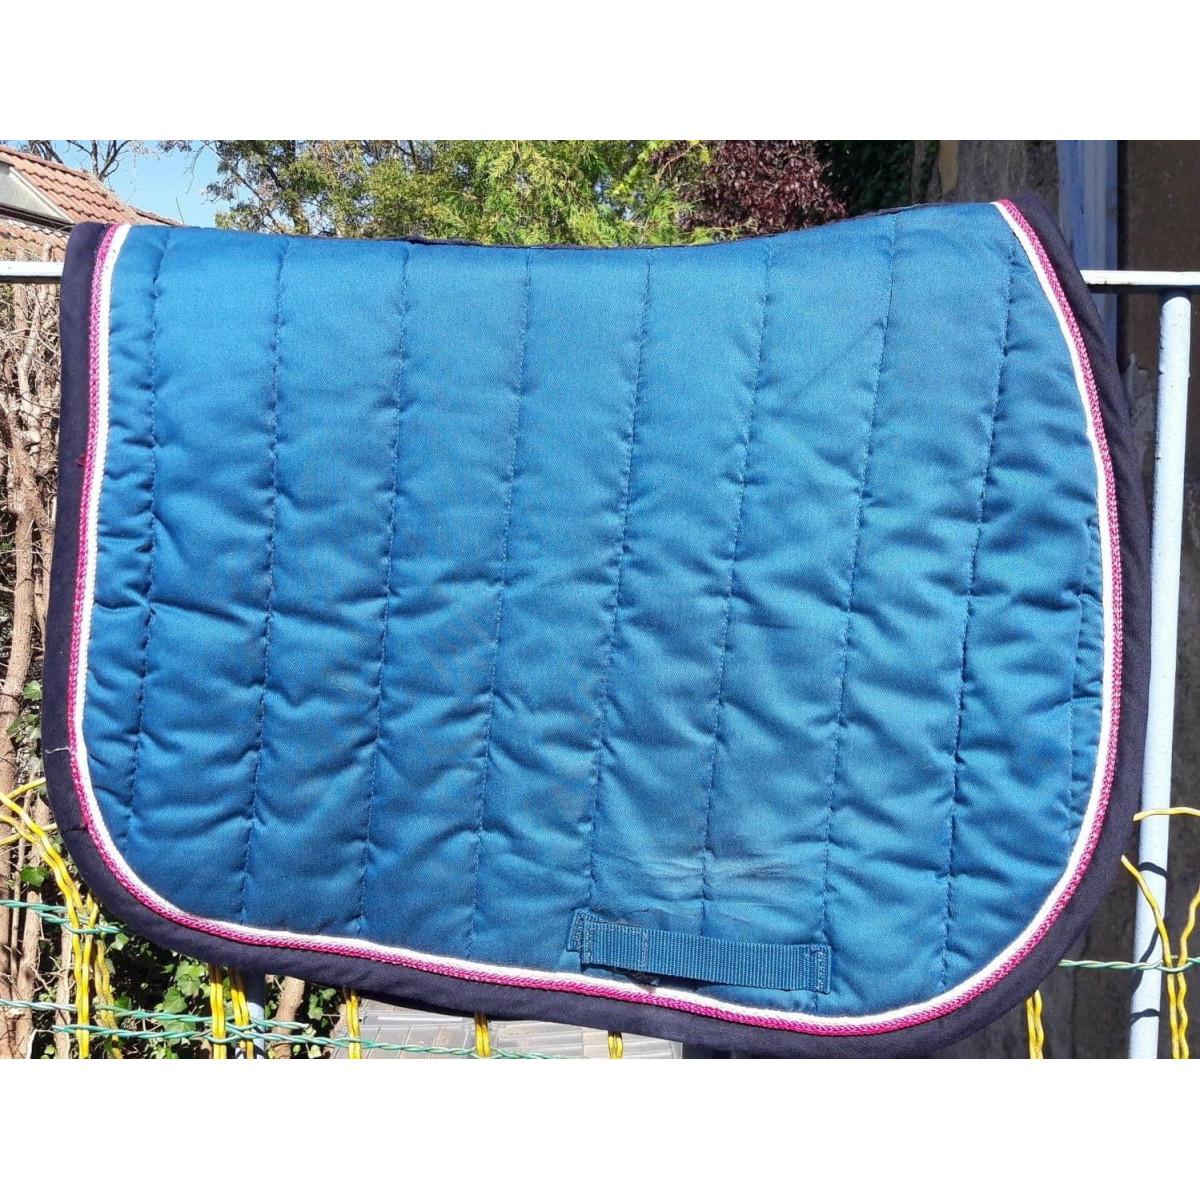 tapis de selle bleu petrole marine taille poney cheval fouganza